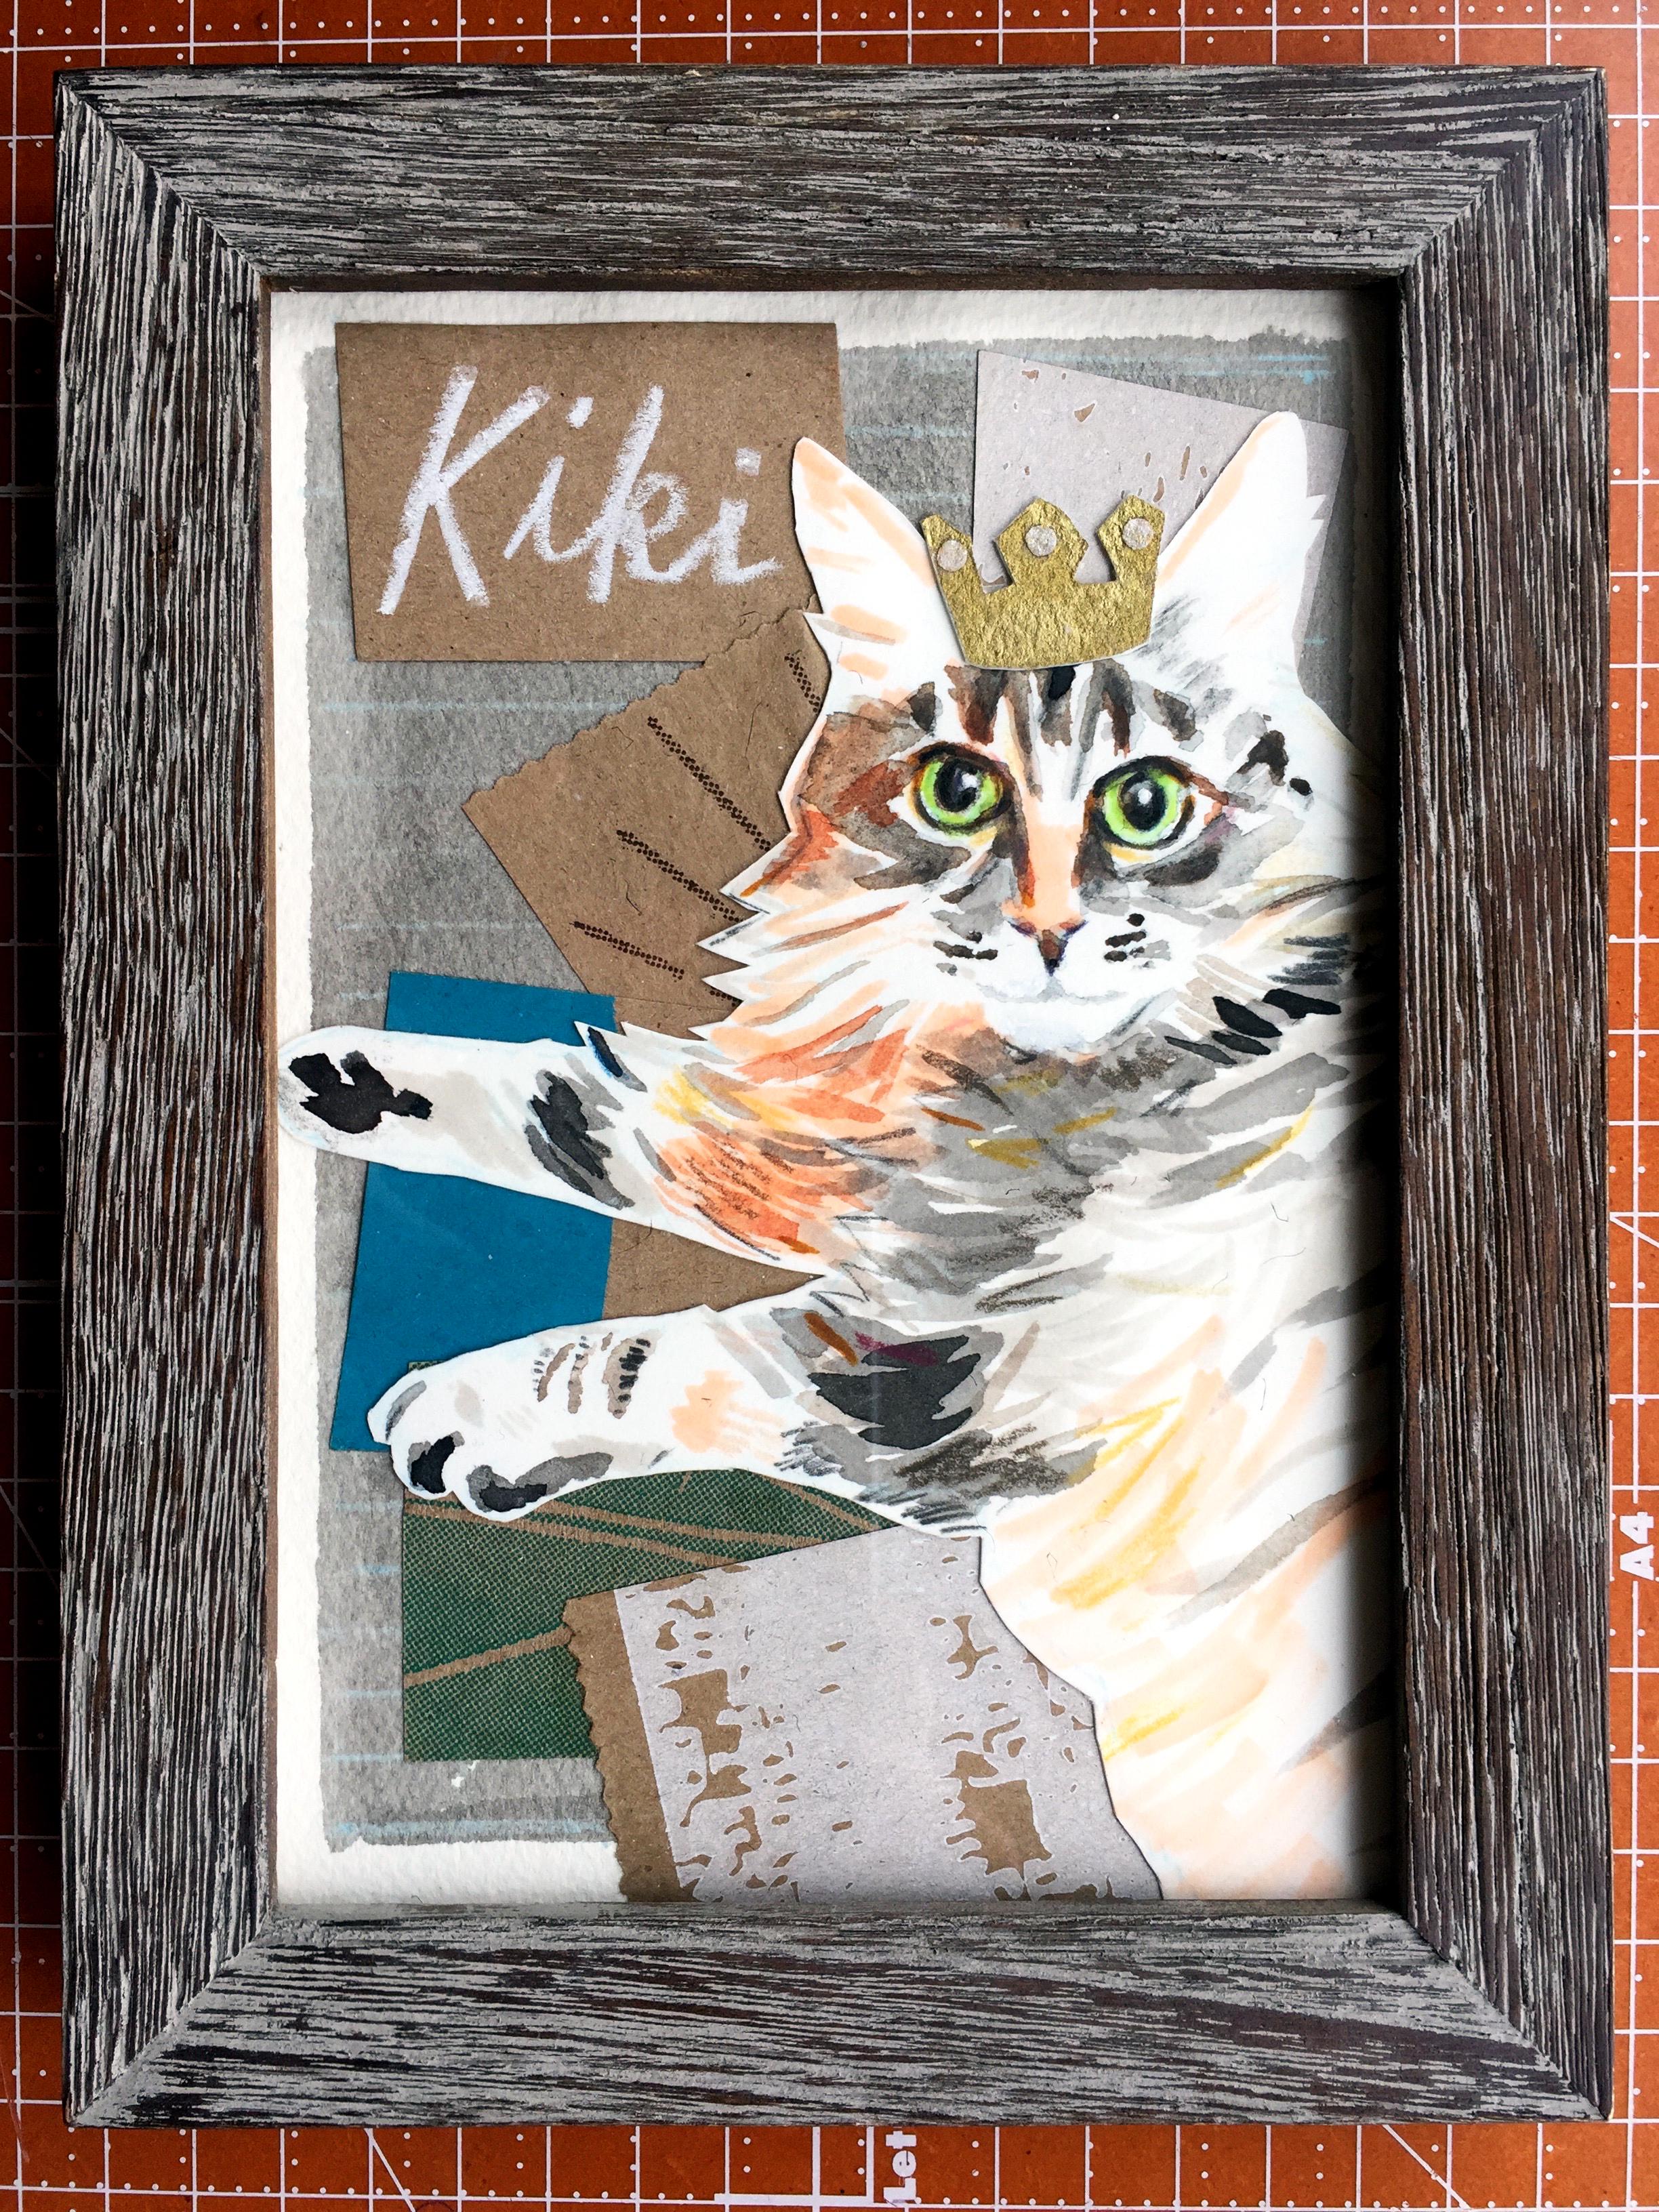 Kiki | Sarah Wildfang